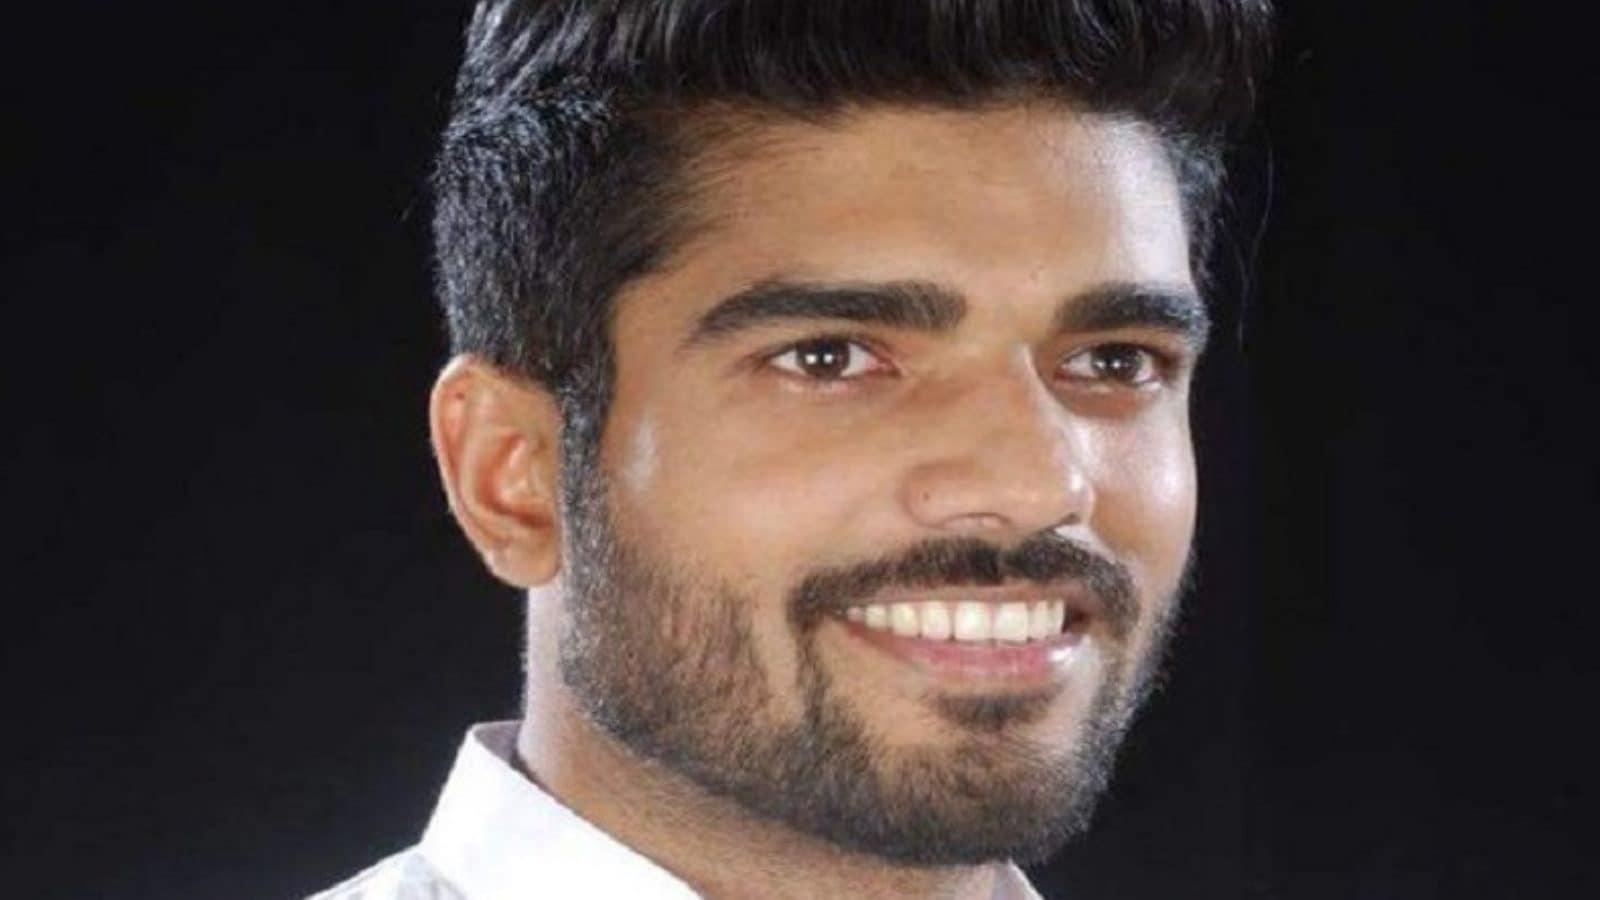 Court Reserves Order on LJP MP Prince Raj's Anticipatory Bail Plea in Rape Case